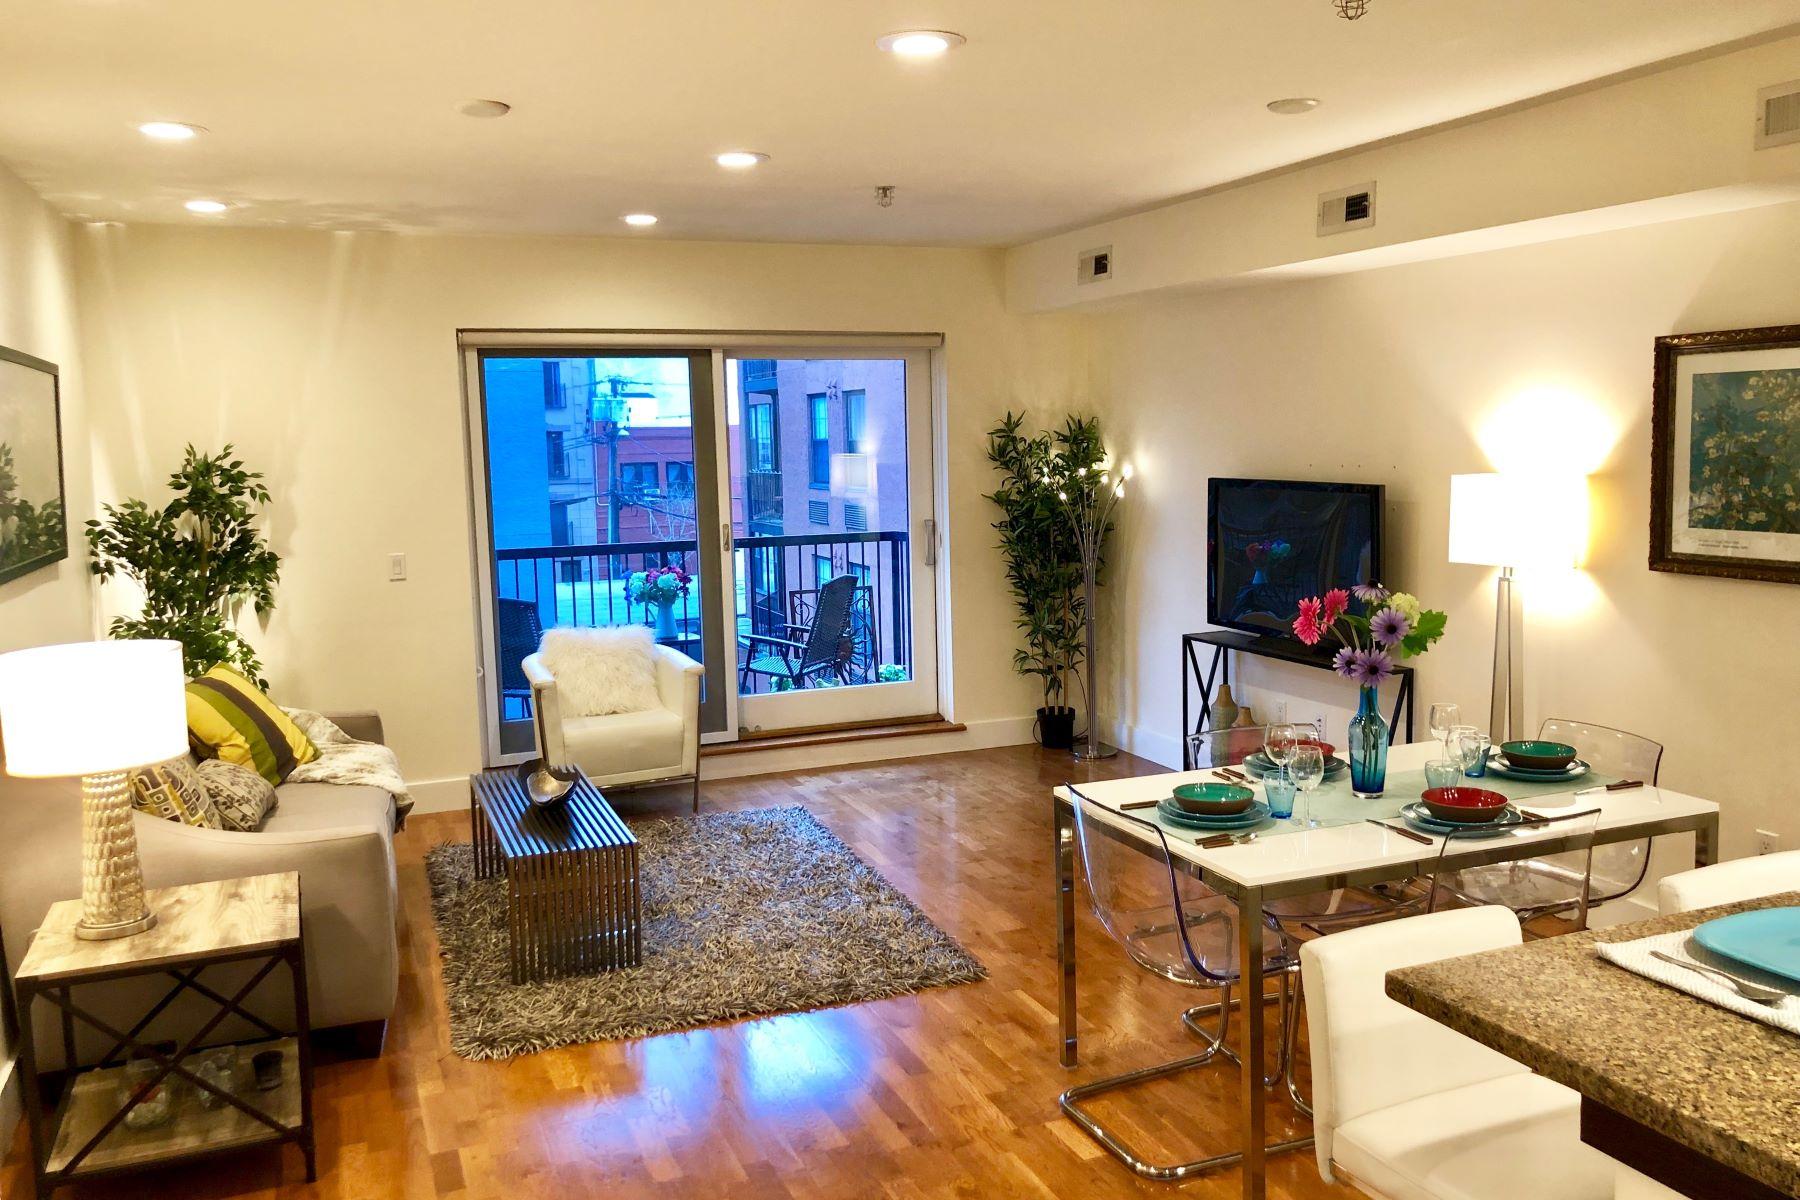 Condominium for Sale at Boutique elevator building 3 bed, 3 bath duplex condo 109 Harrison Street #302, Hoboken, New Jersey 07030 United States